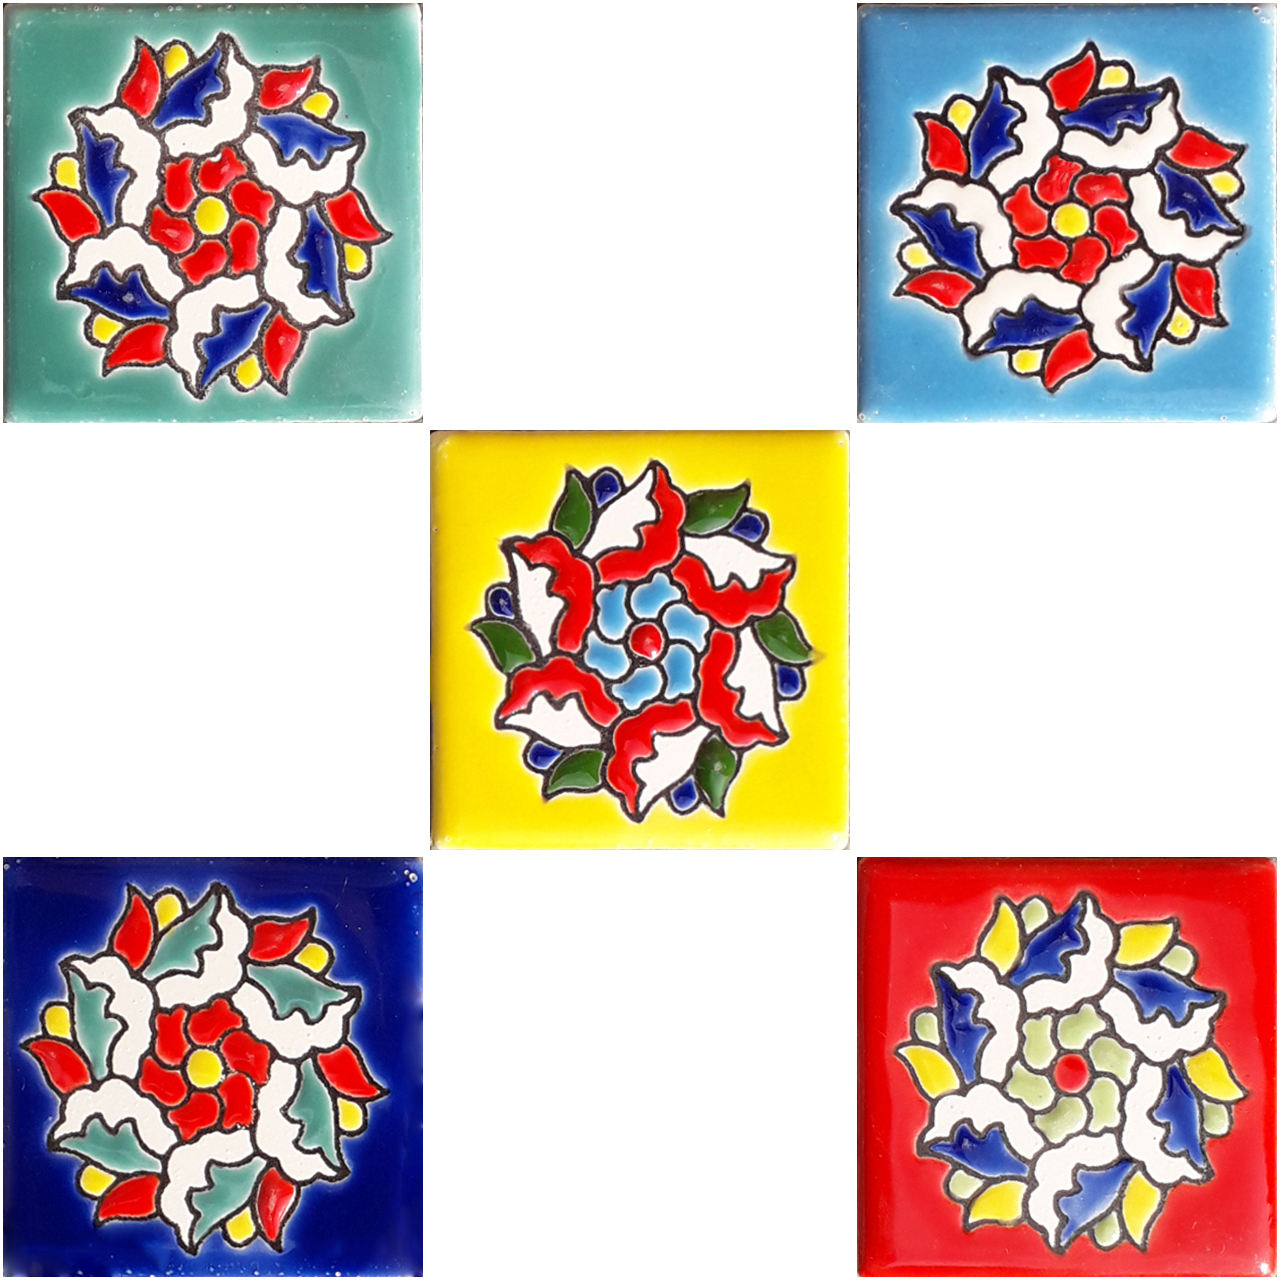 مگنت طرح گل کاشی کد 0249 بسته 5 عددی